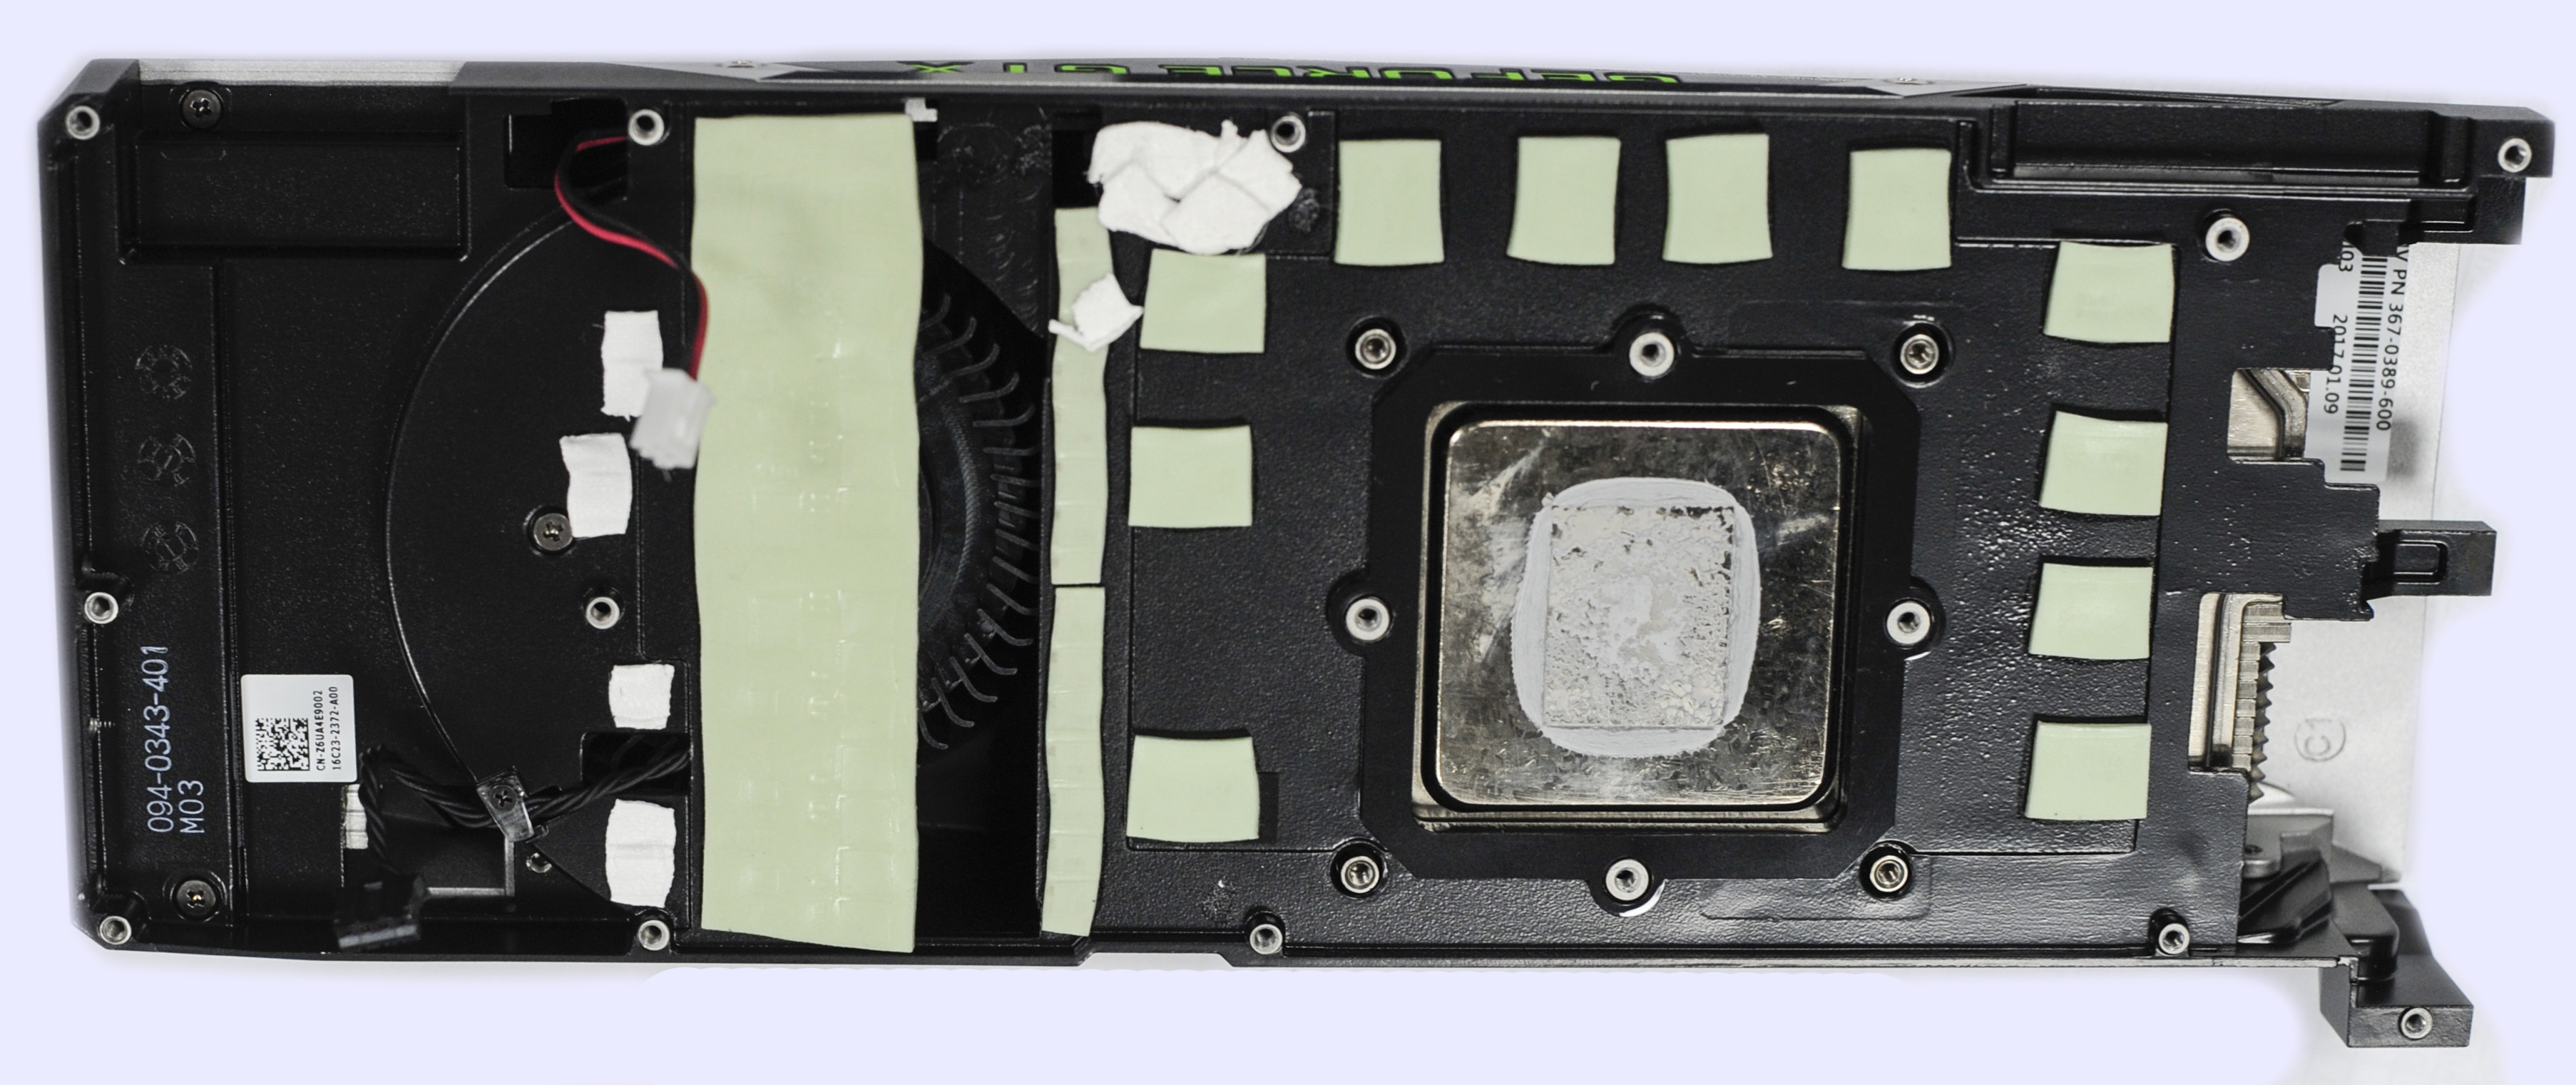 xDevs com | Extreme OC modifications for EVGA GeForce GTX 1080Ti FE